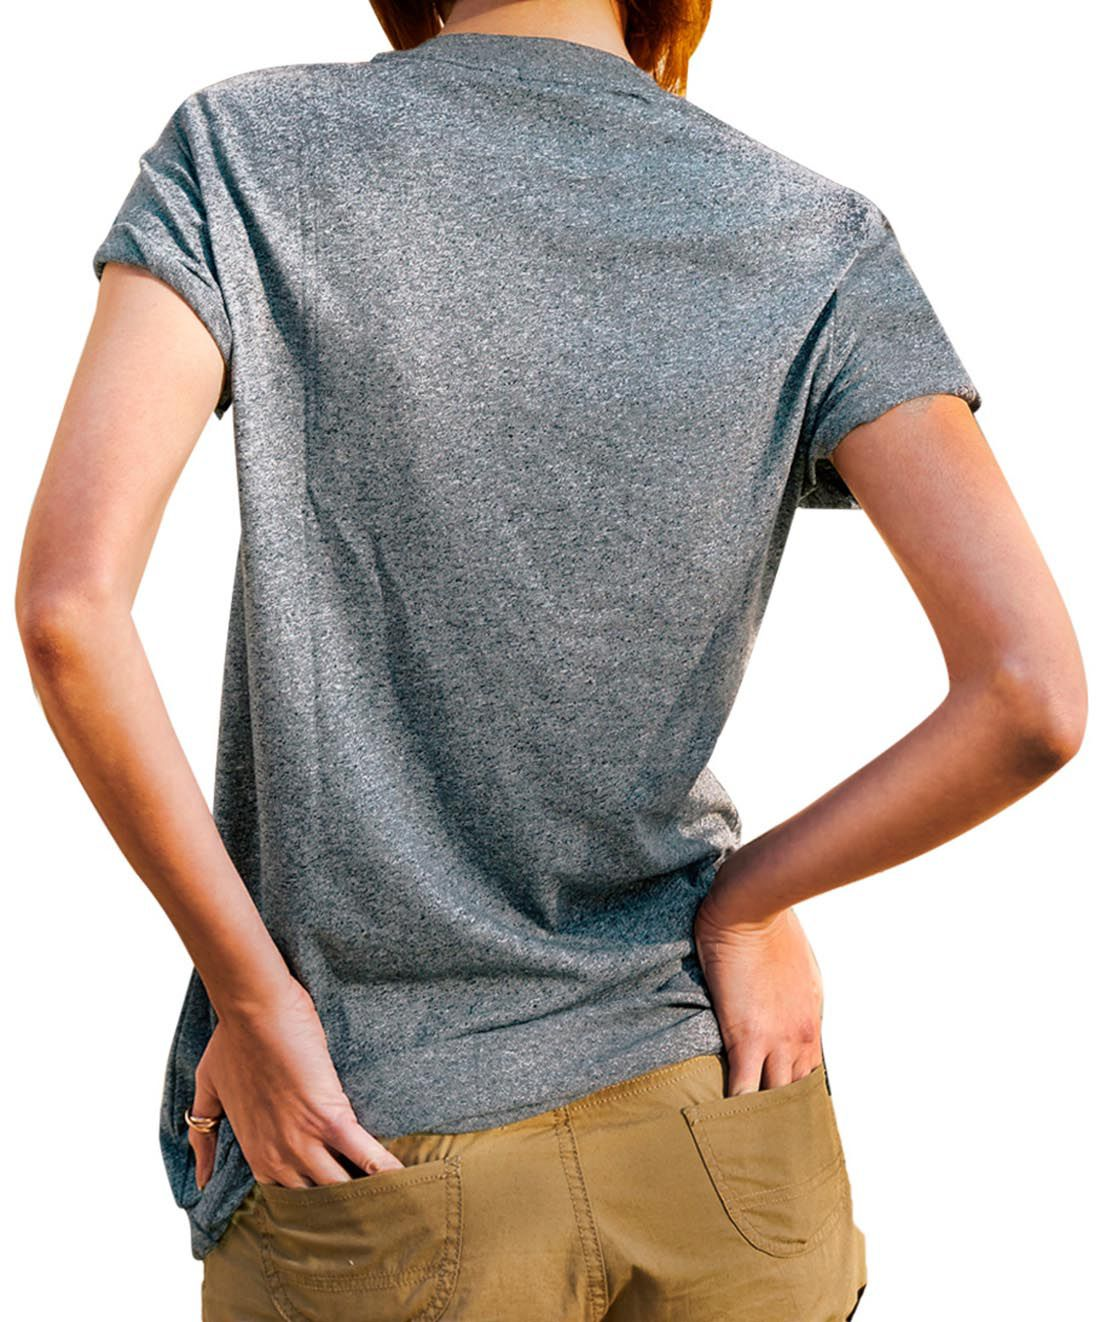 Blusa Outlet Dri T-Shirt Estampada Old Colored Man Cinza